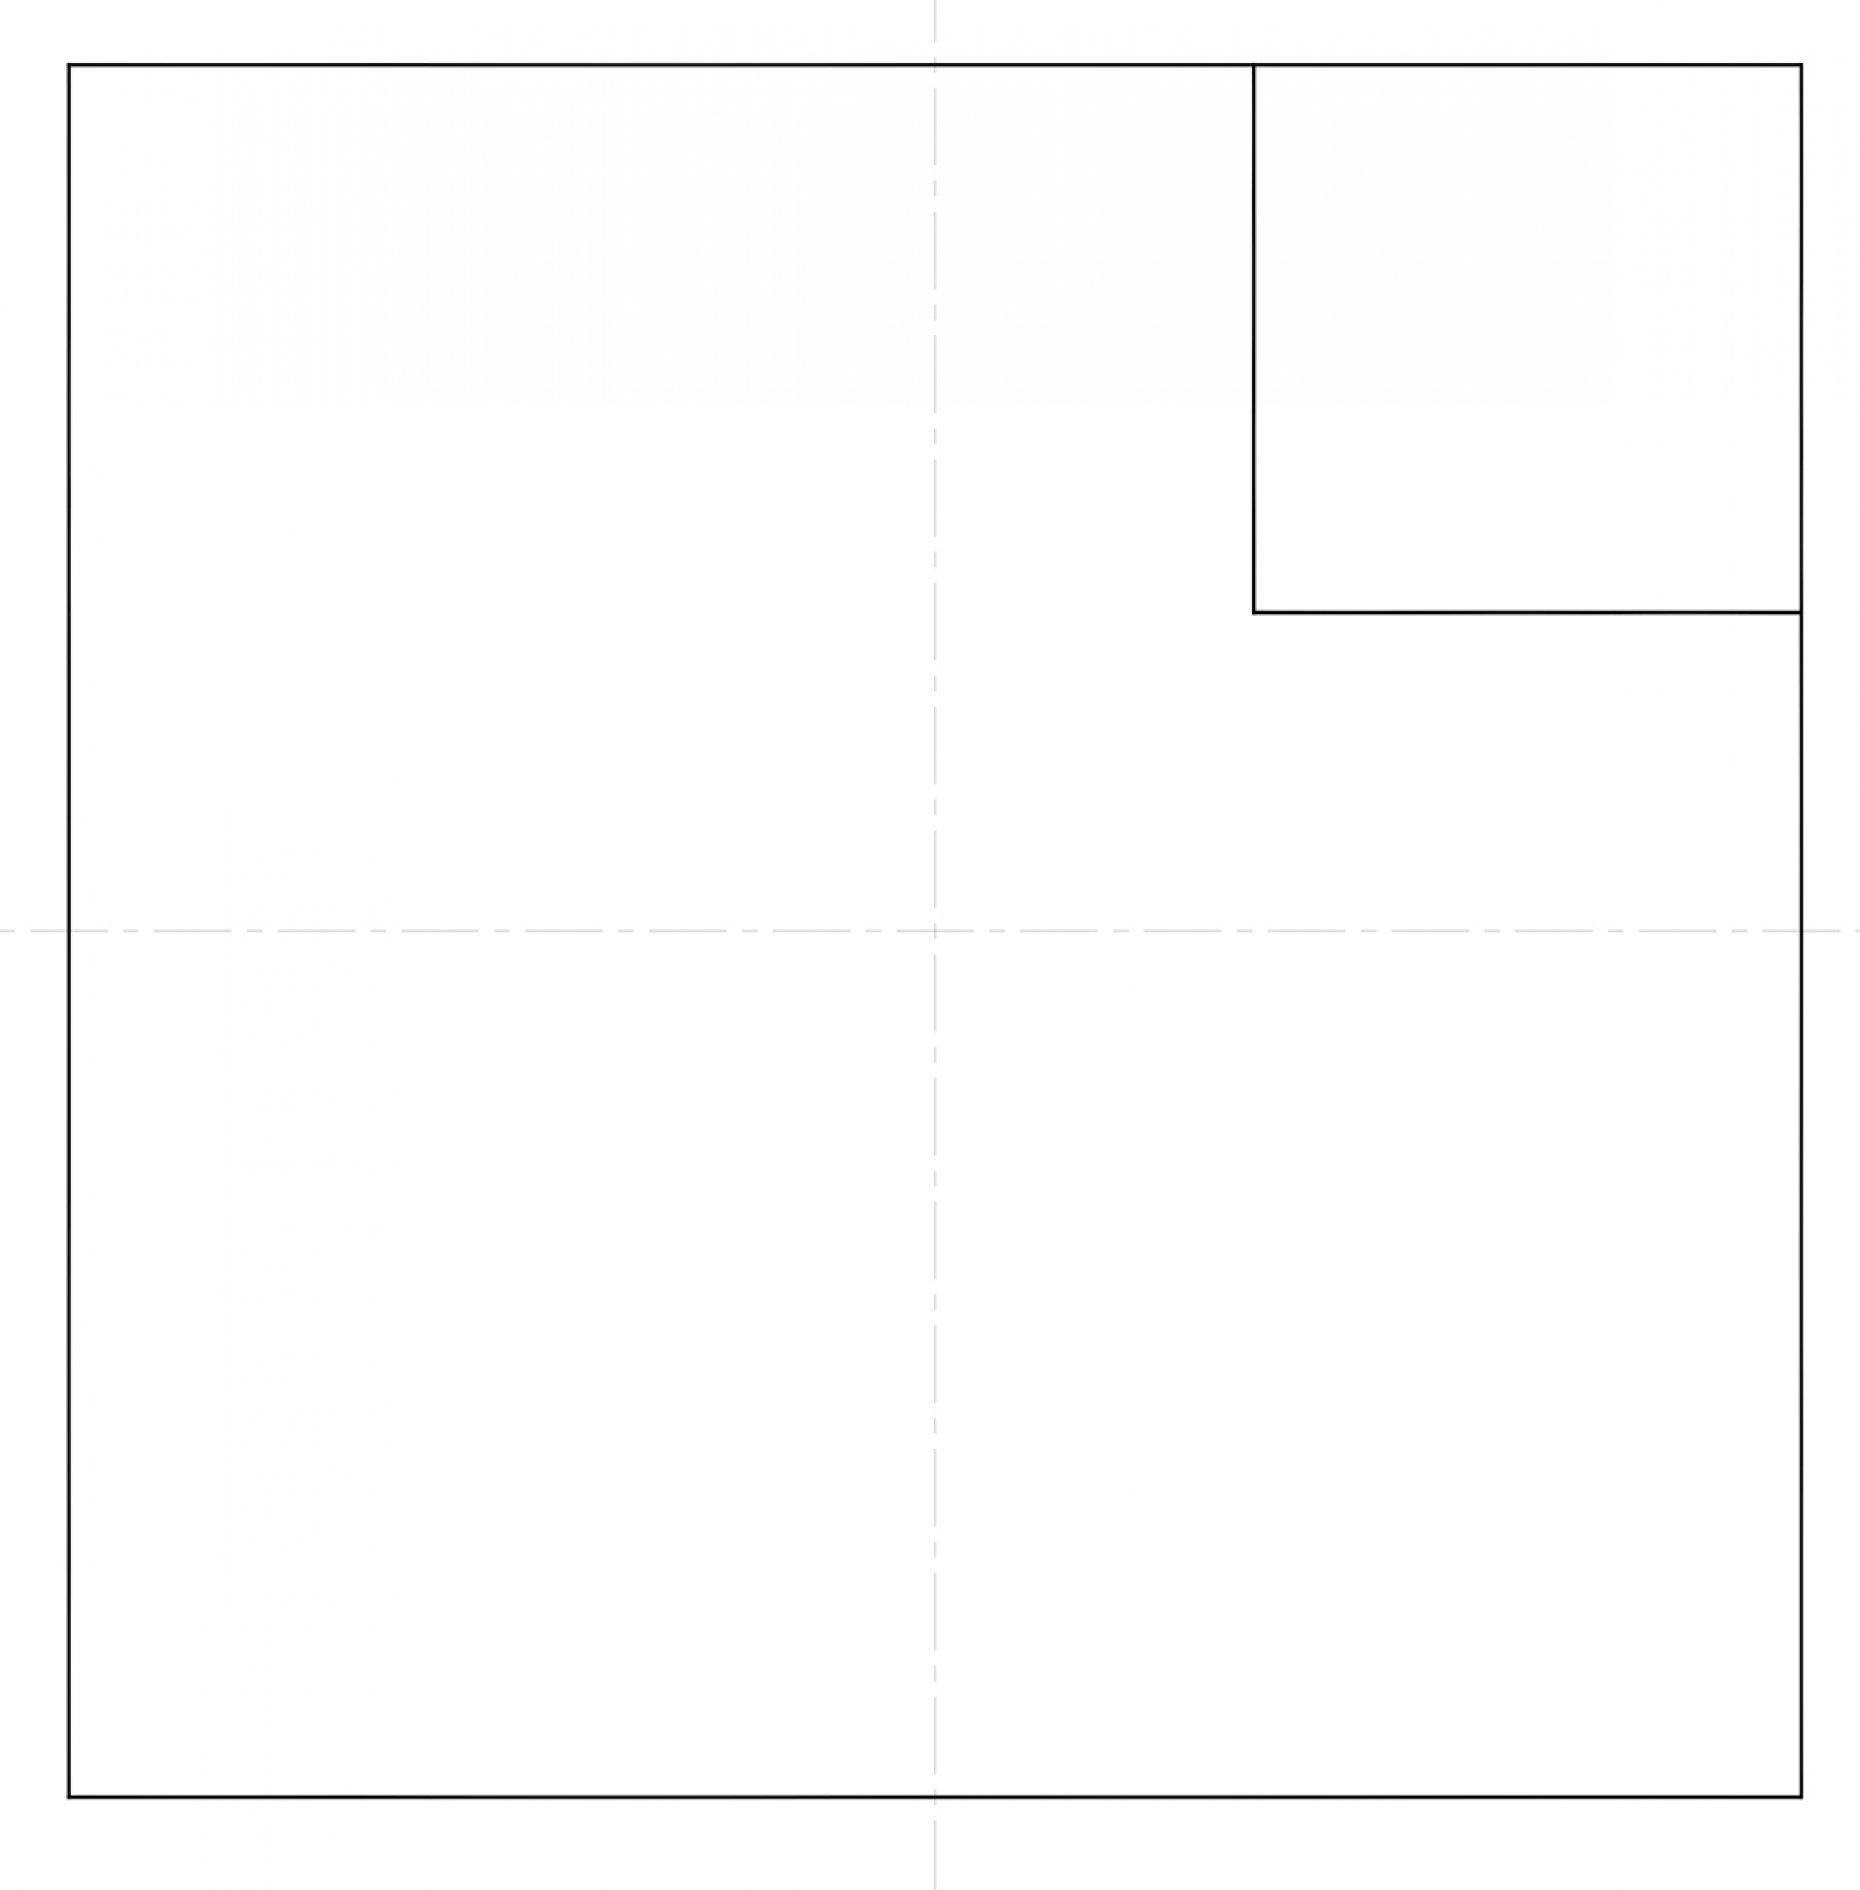 NE57 Miller Squares Ratio 9:1 Pattern